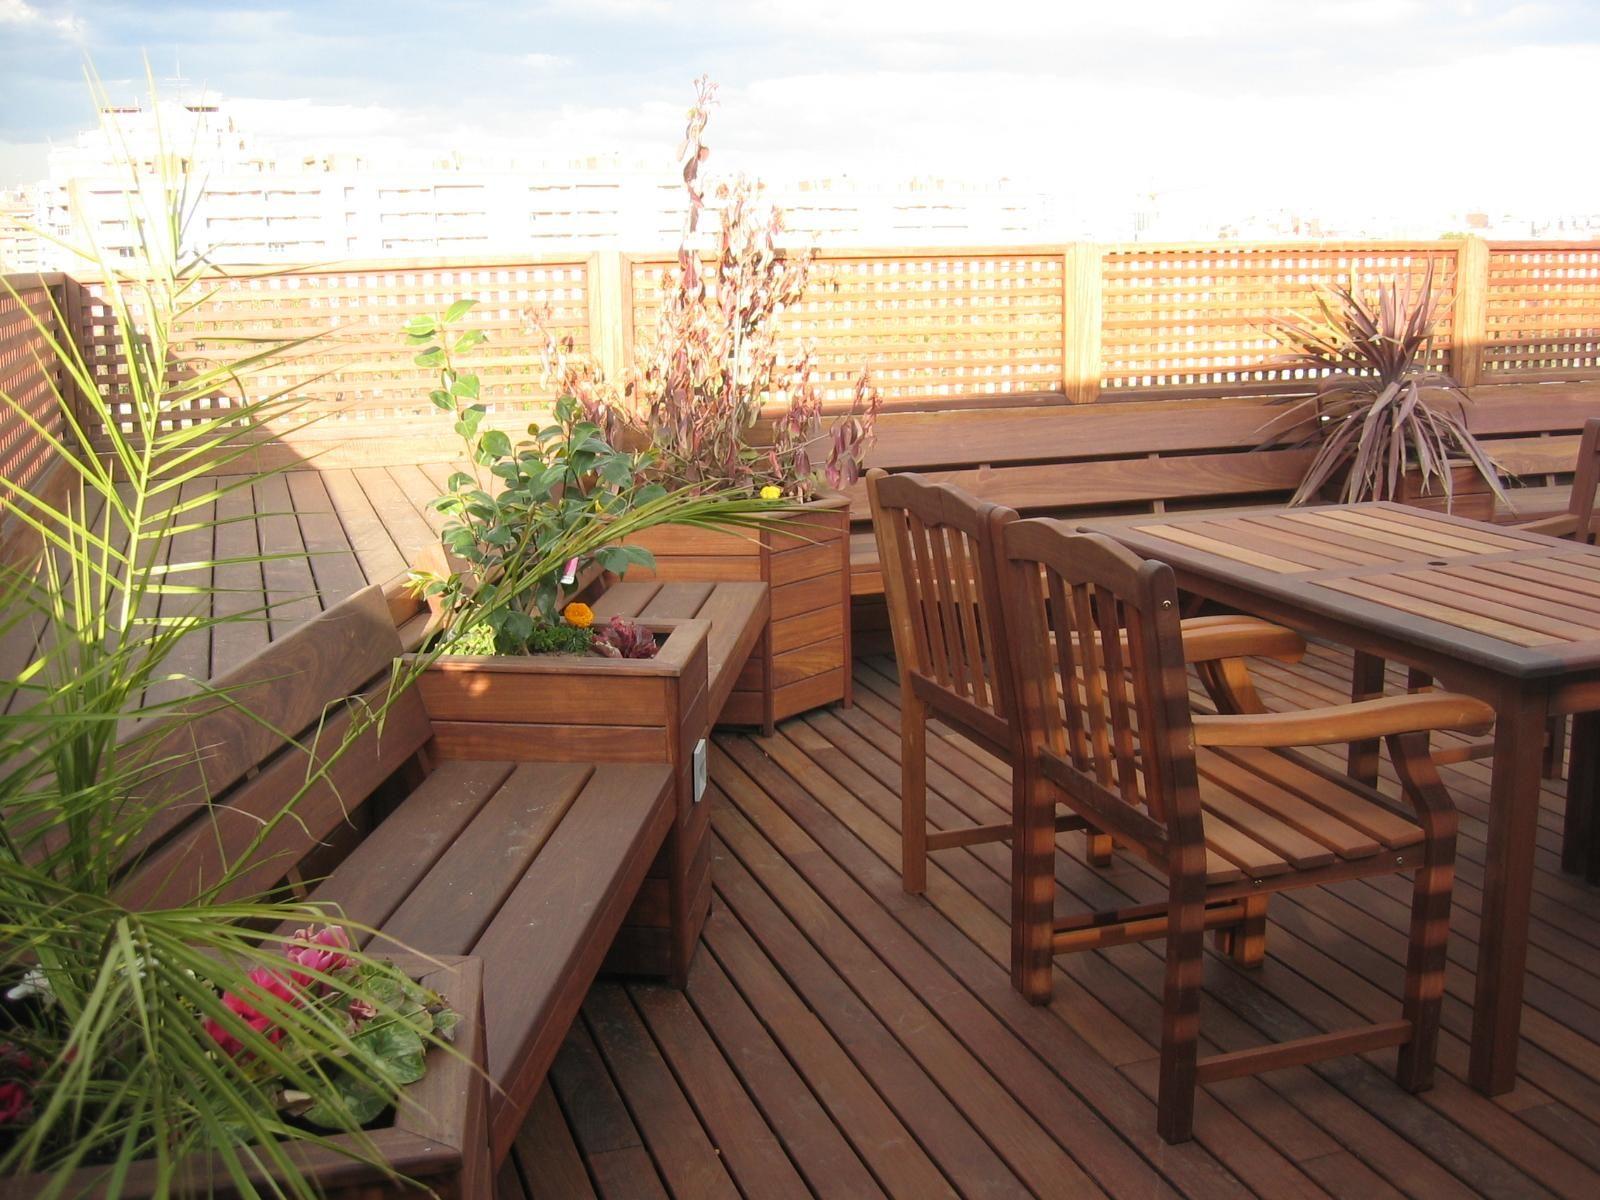 New Deck Stain Color Cabot Honey Teak Porch